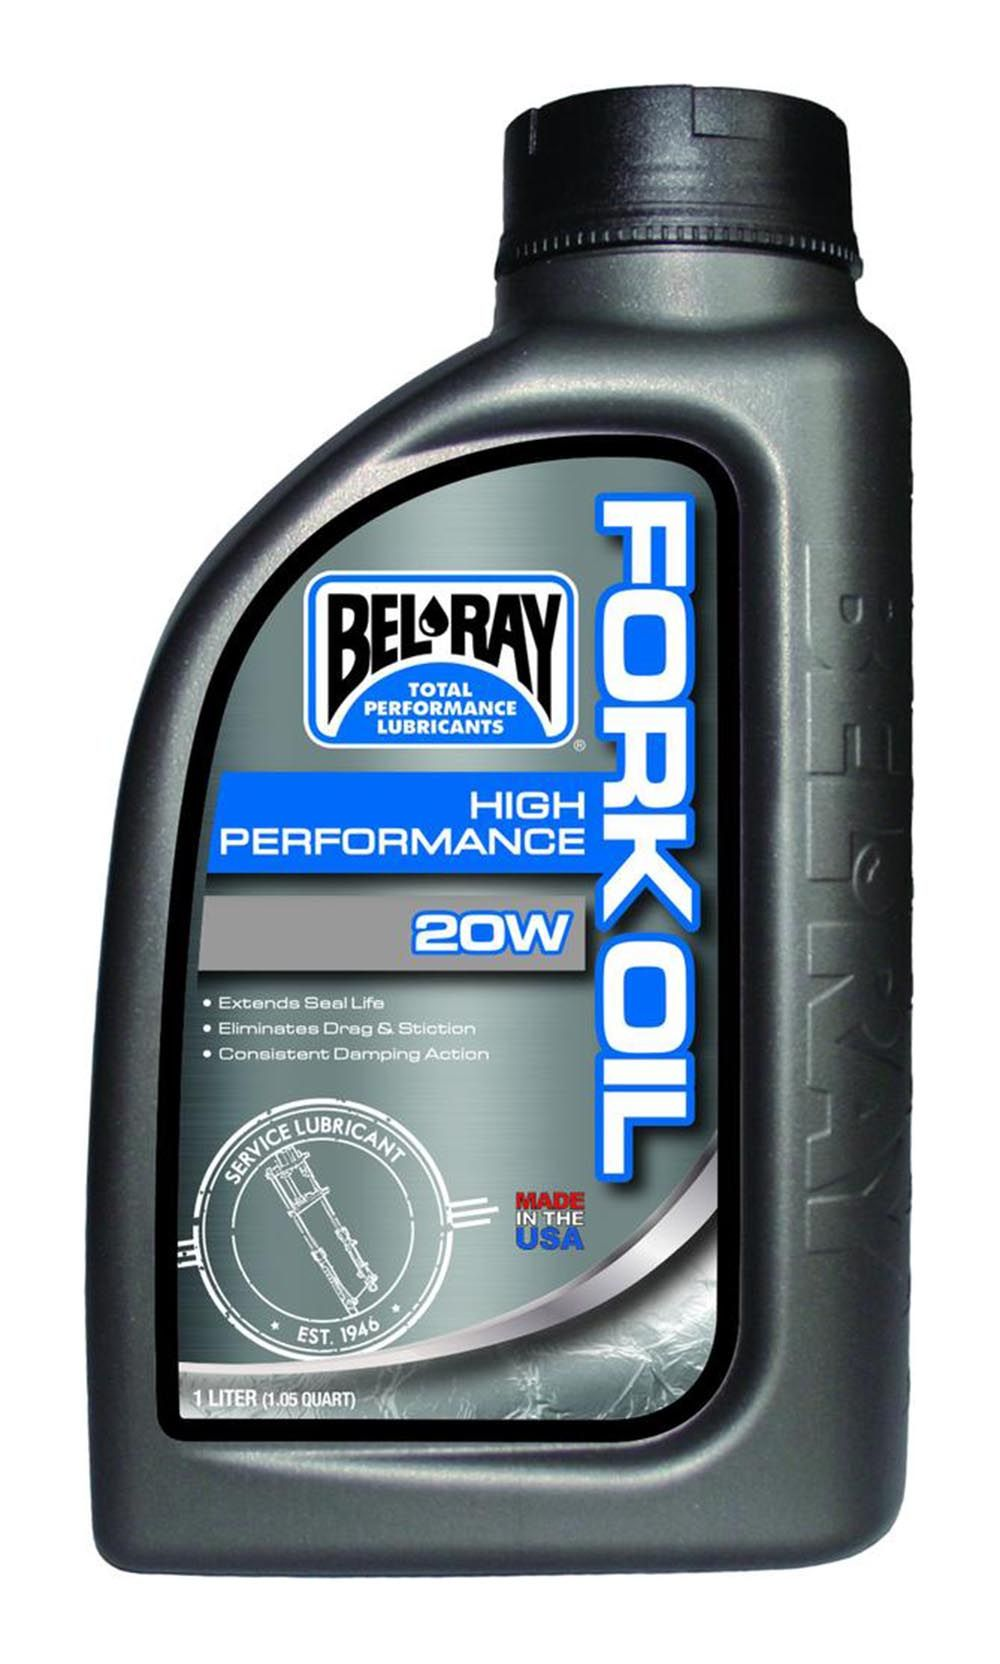 Bel-Ray High Performance Fork Oil 20W (1 Liter)